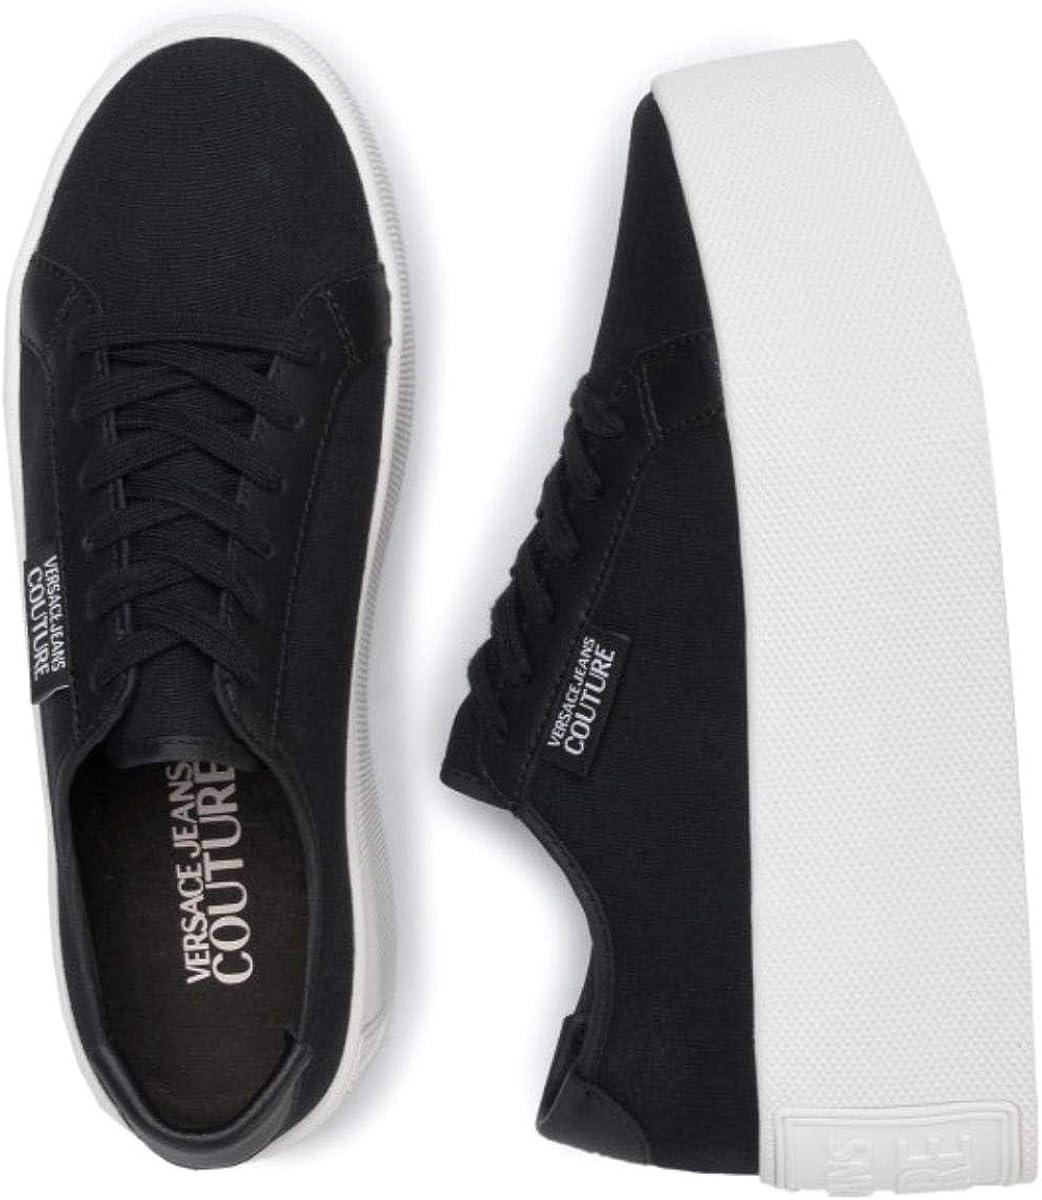 Versace JEANS Couture Damen-Sneakers – E0VVBSH47138 Schwarz